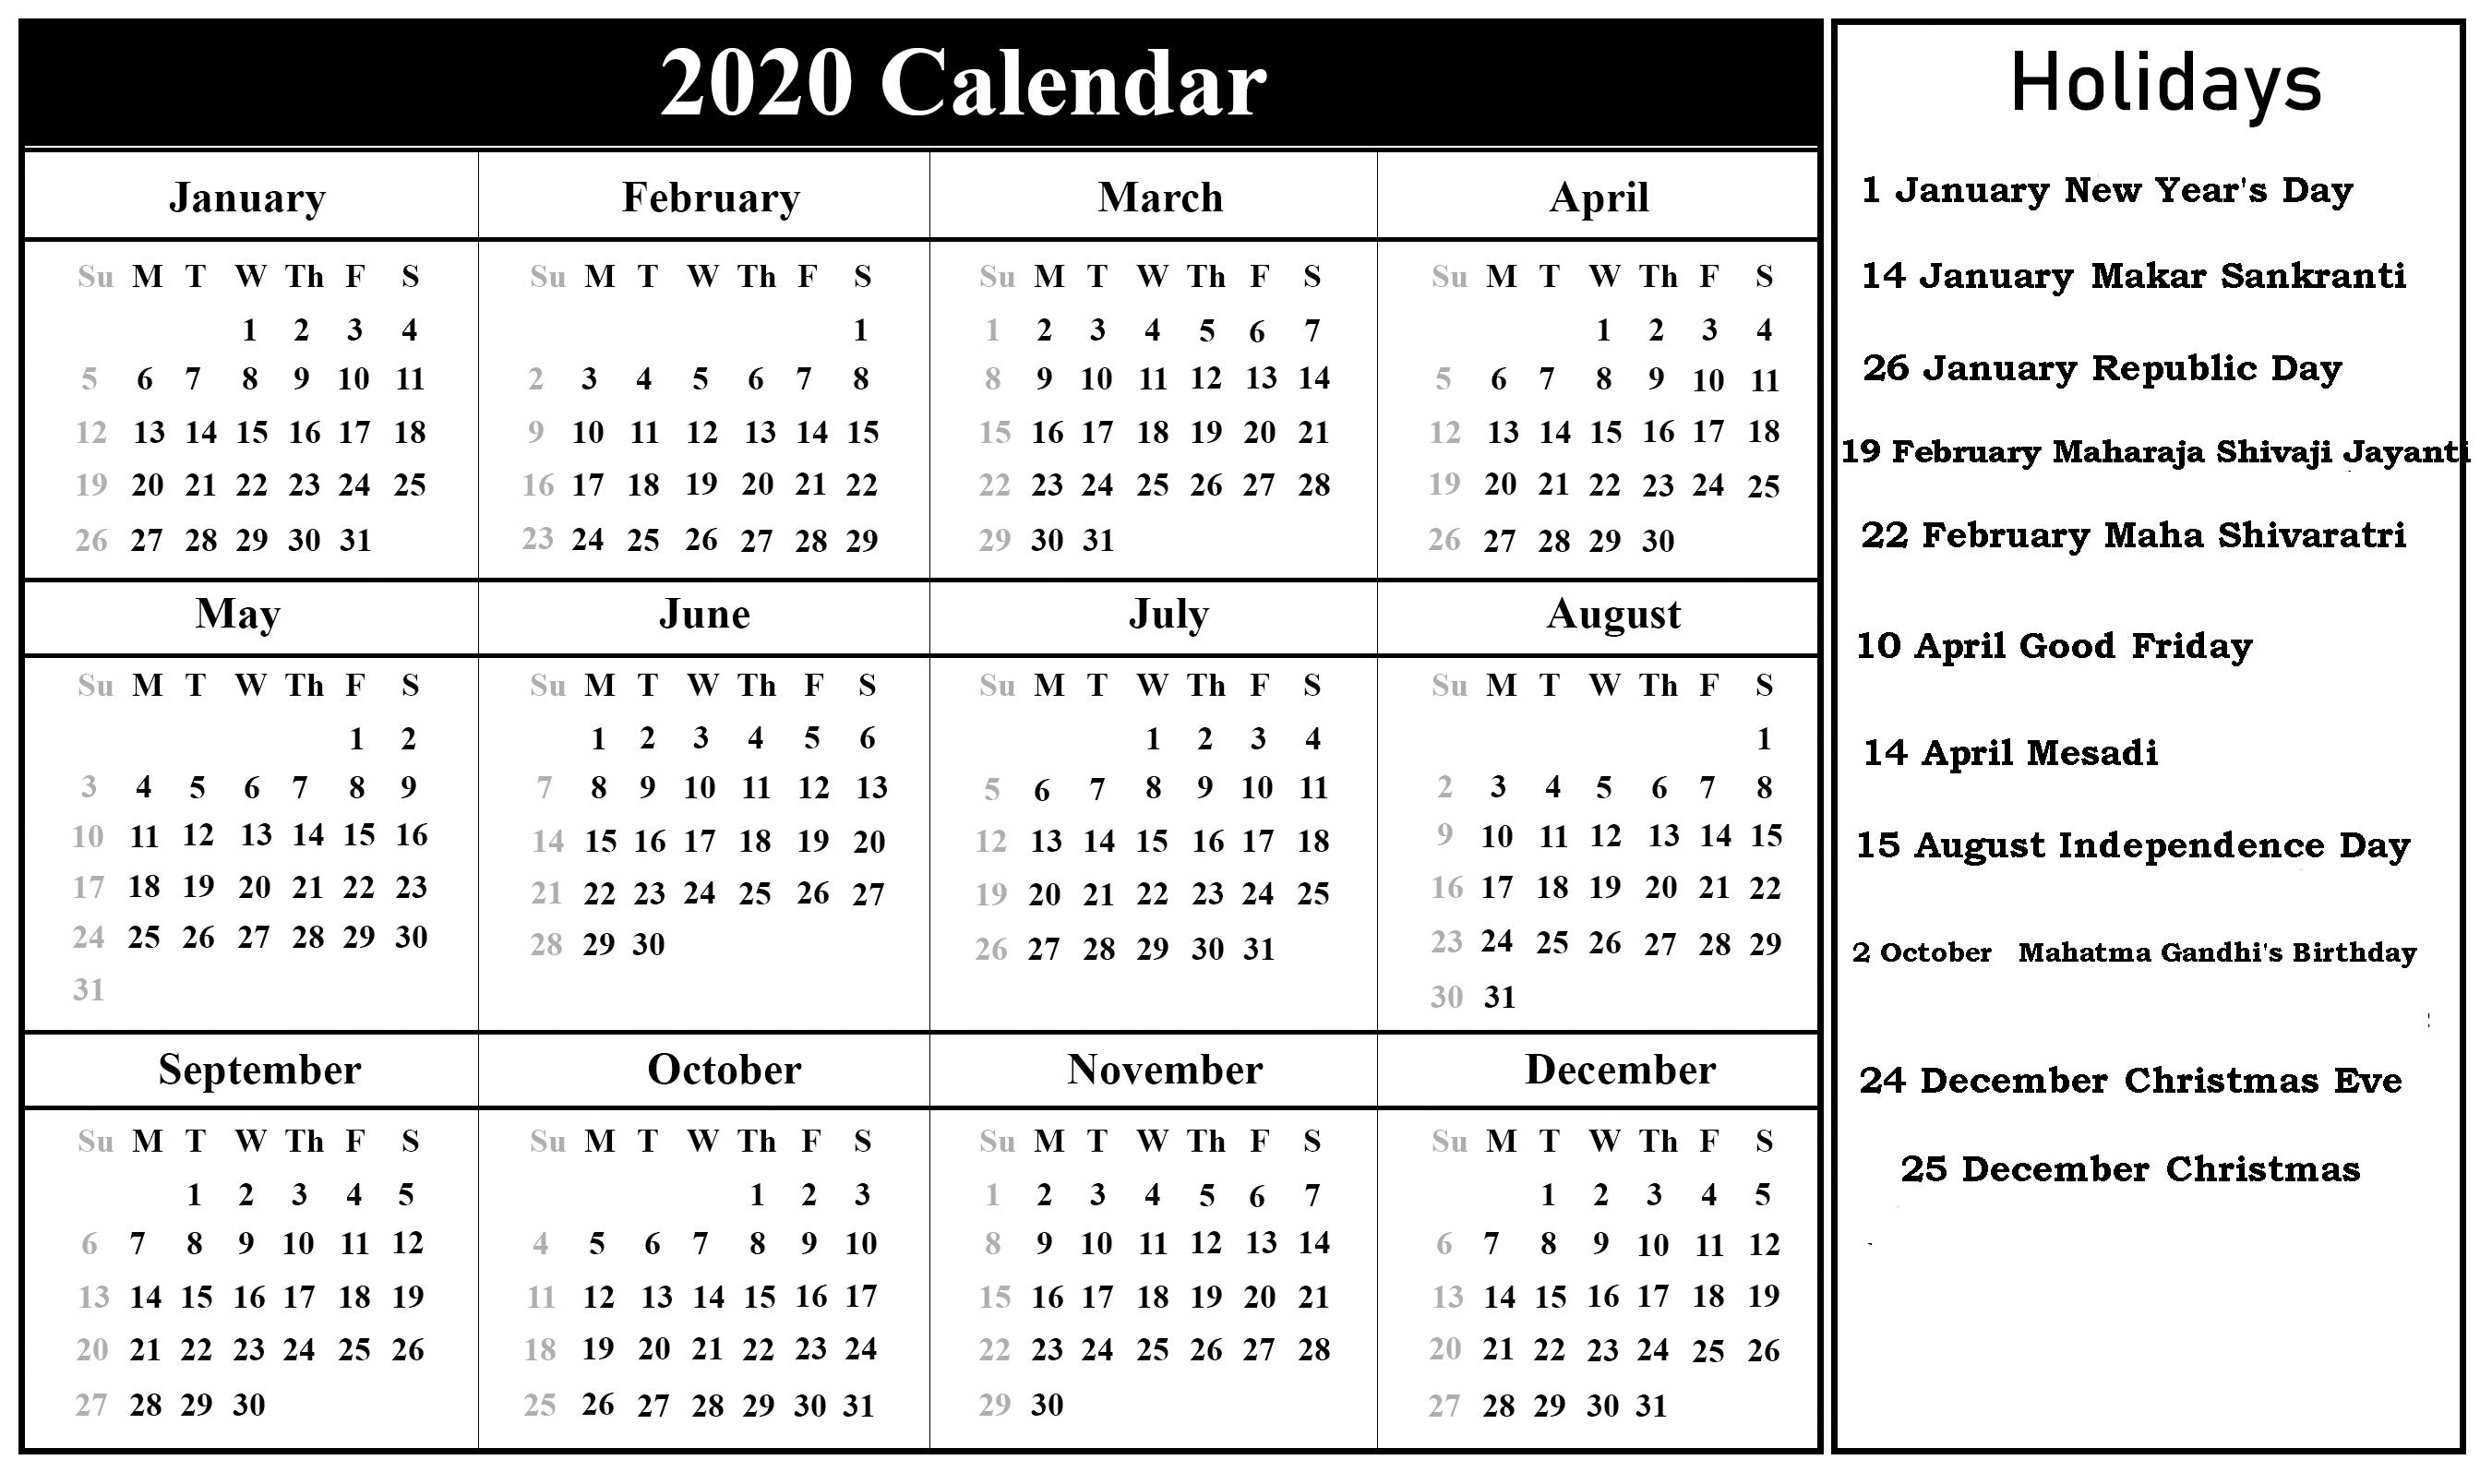 Indian 2020 Holidays Calendar Printable | India Festivals